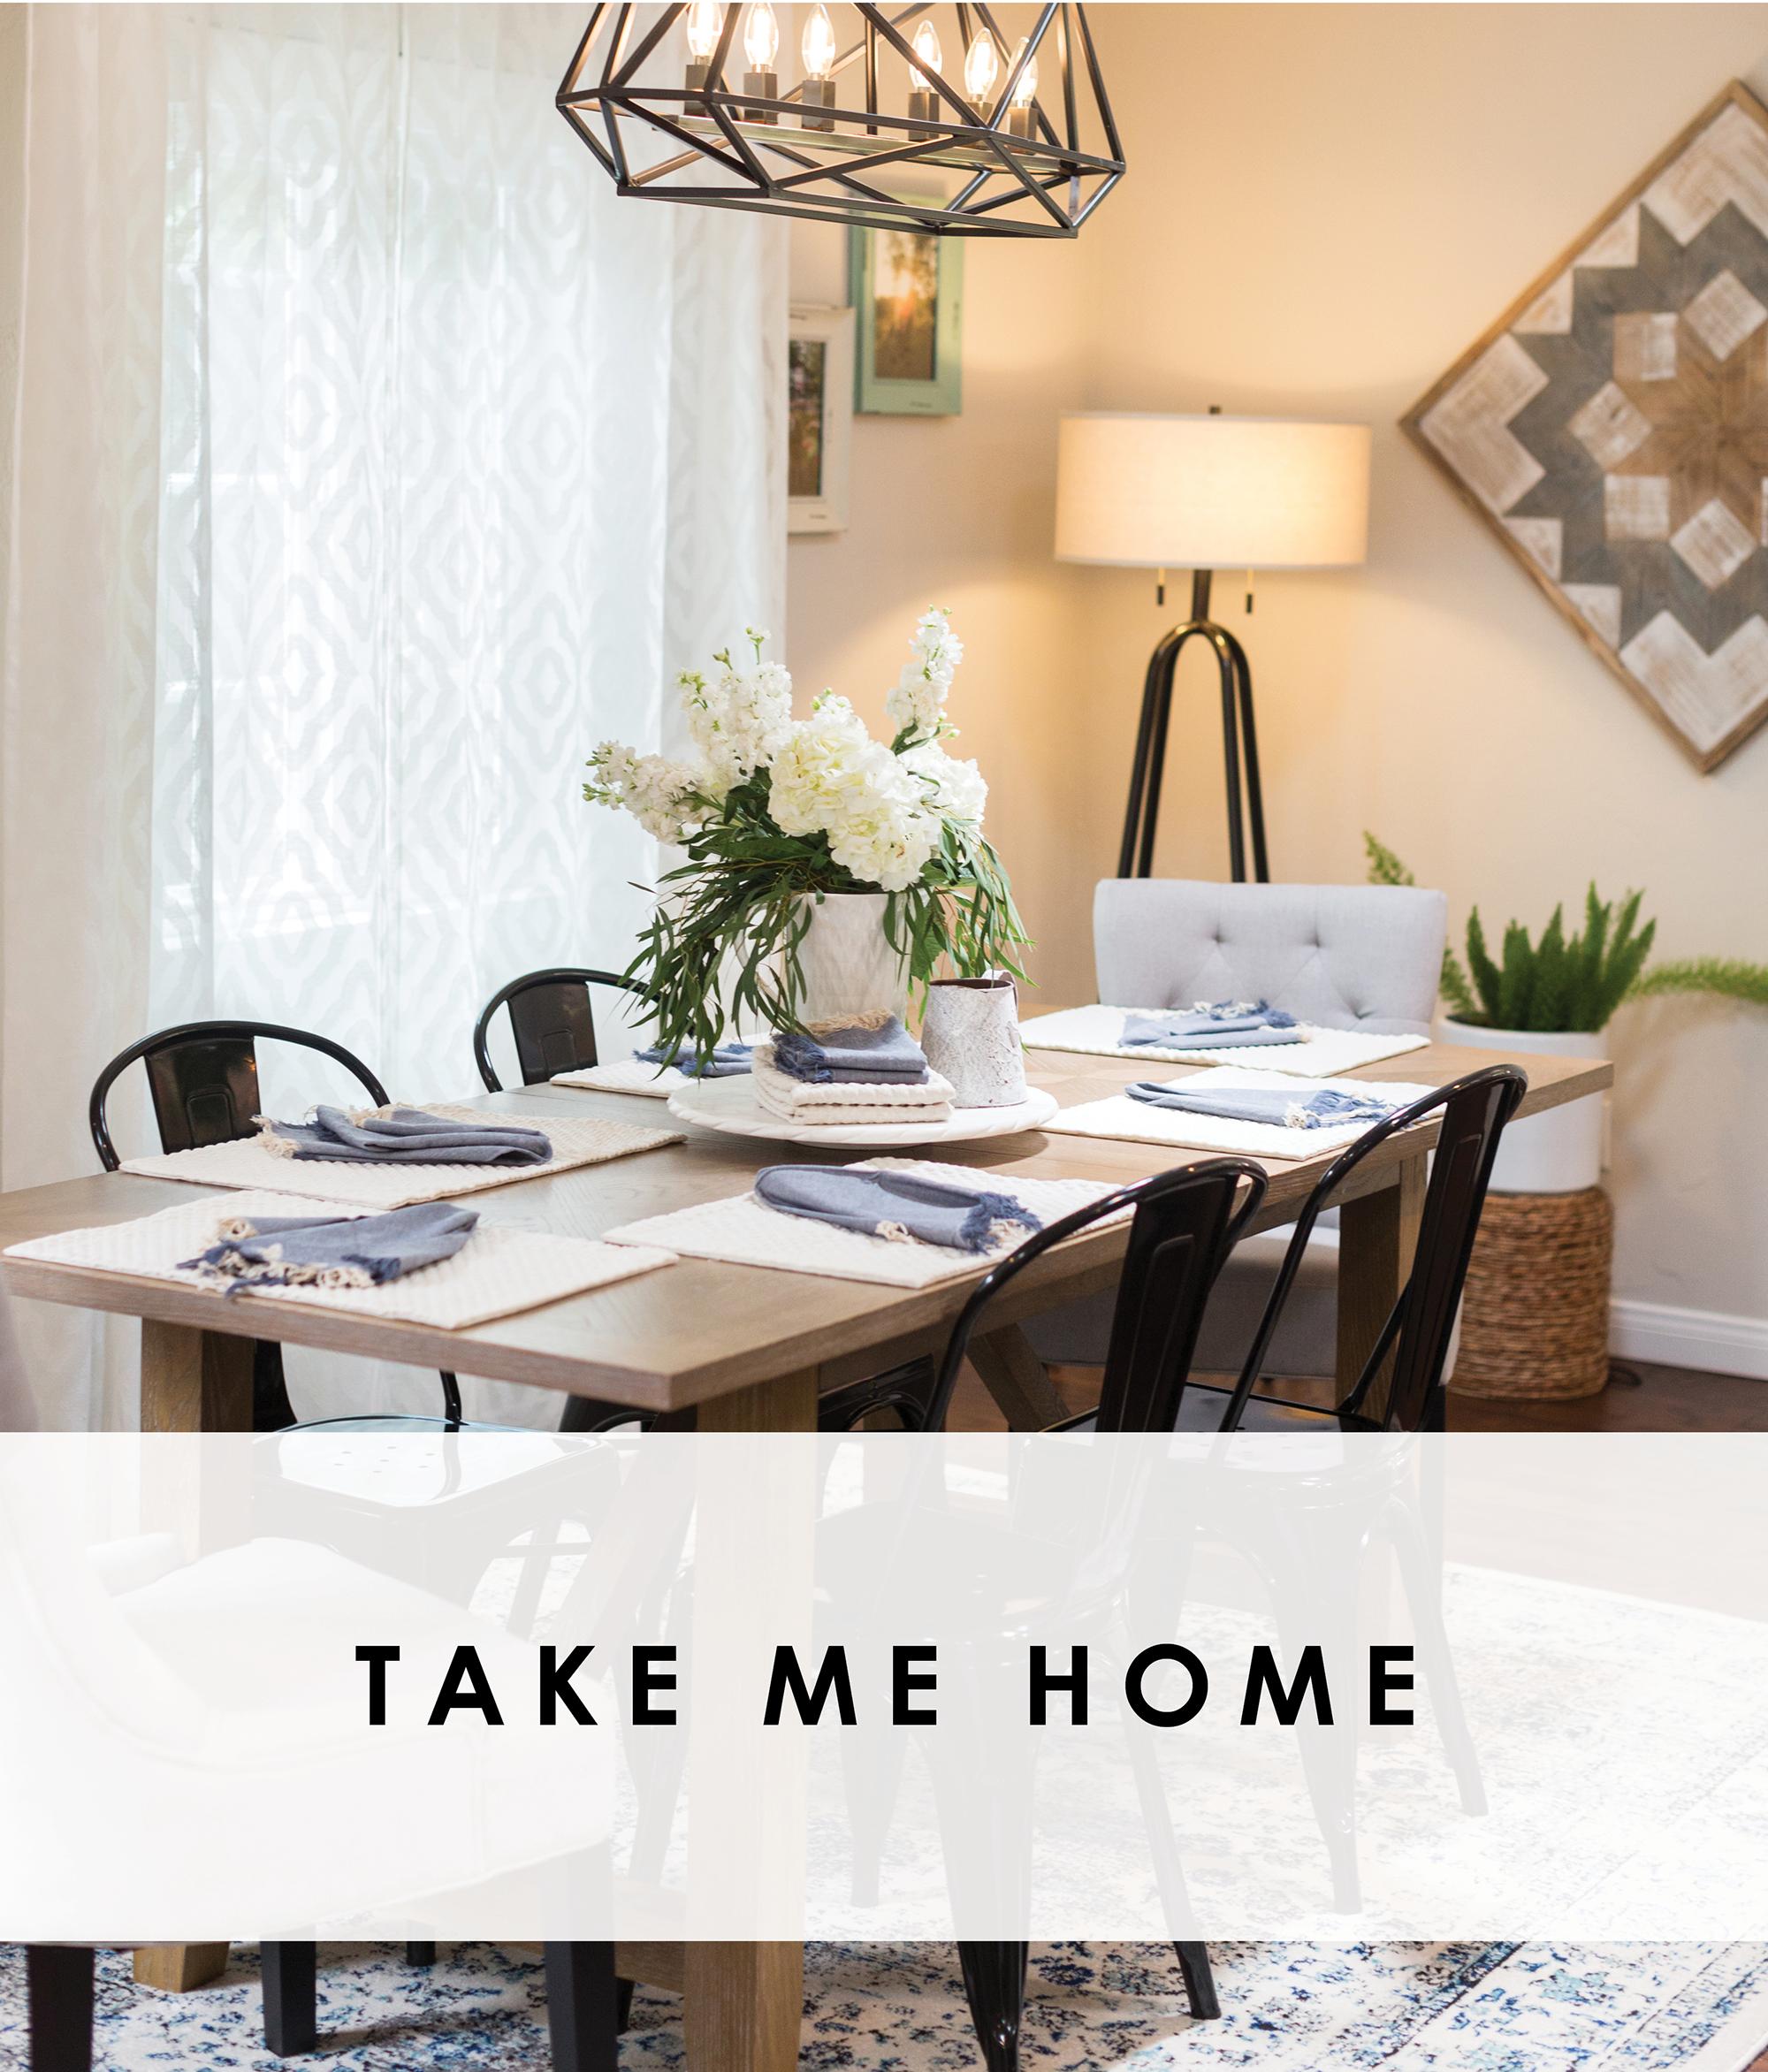 Take Me Home.jpg